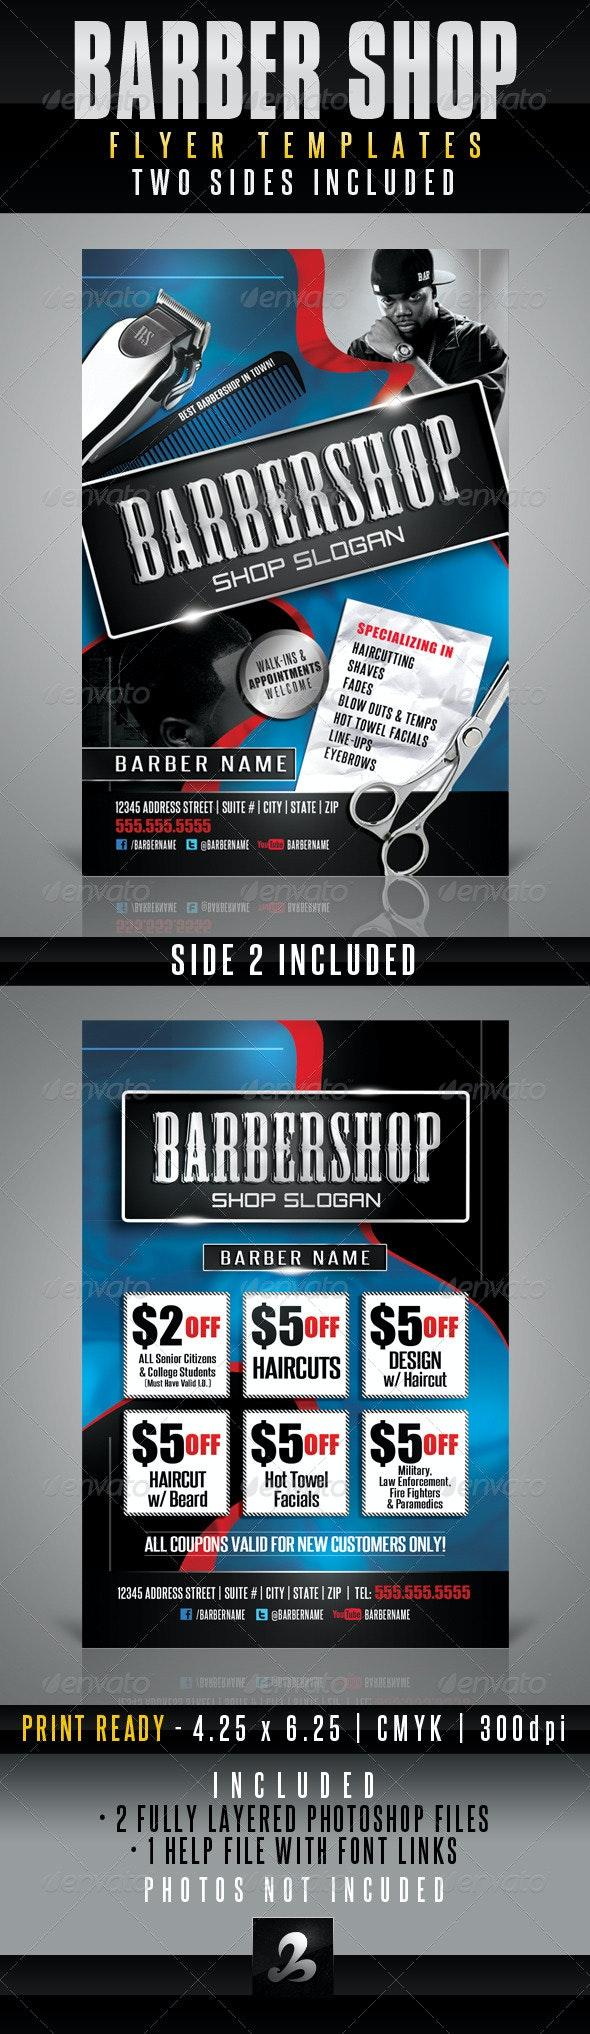 Barbershop Flyer Templates - Corporate Flyers